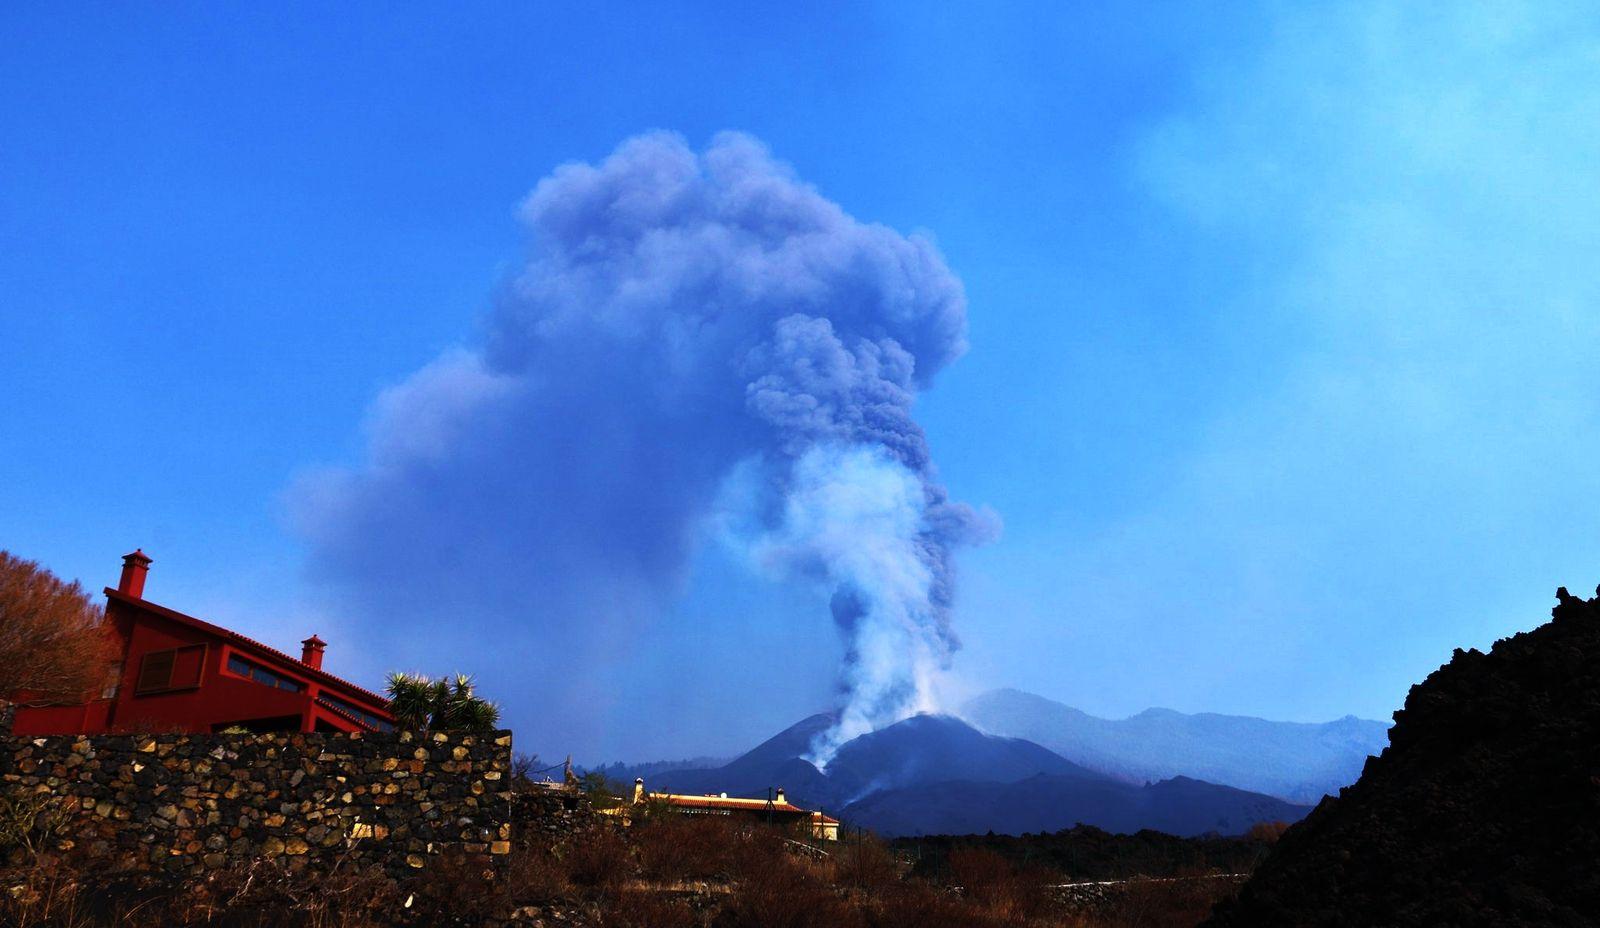 La Palma / Cumbre Vieja - activity increasing as of 07.10.2021 - photo InVolcan